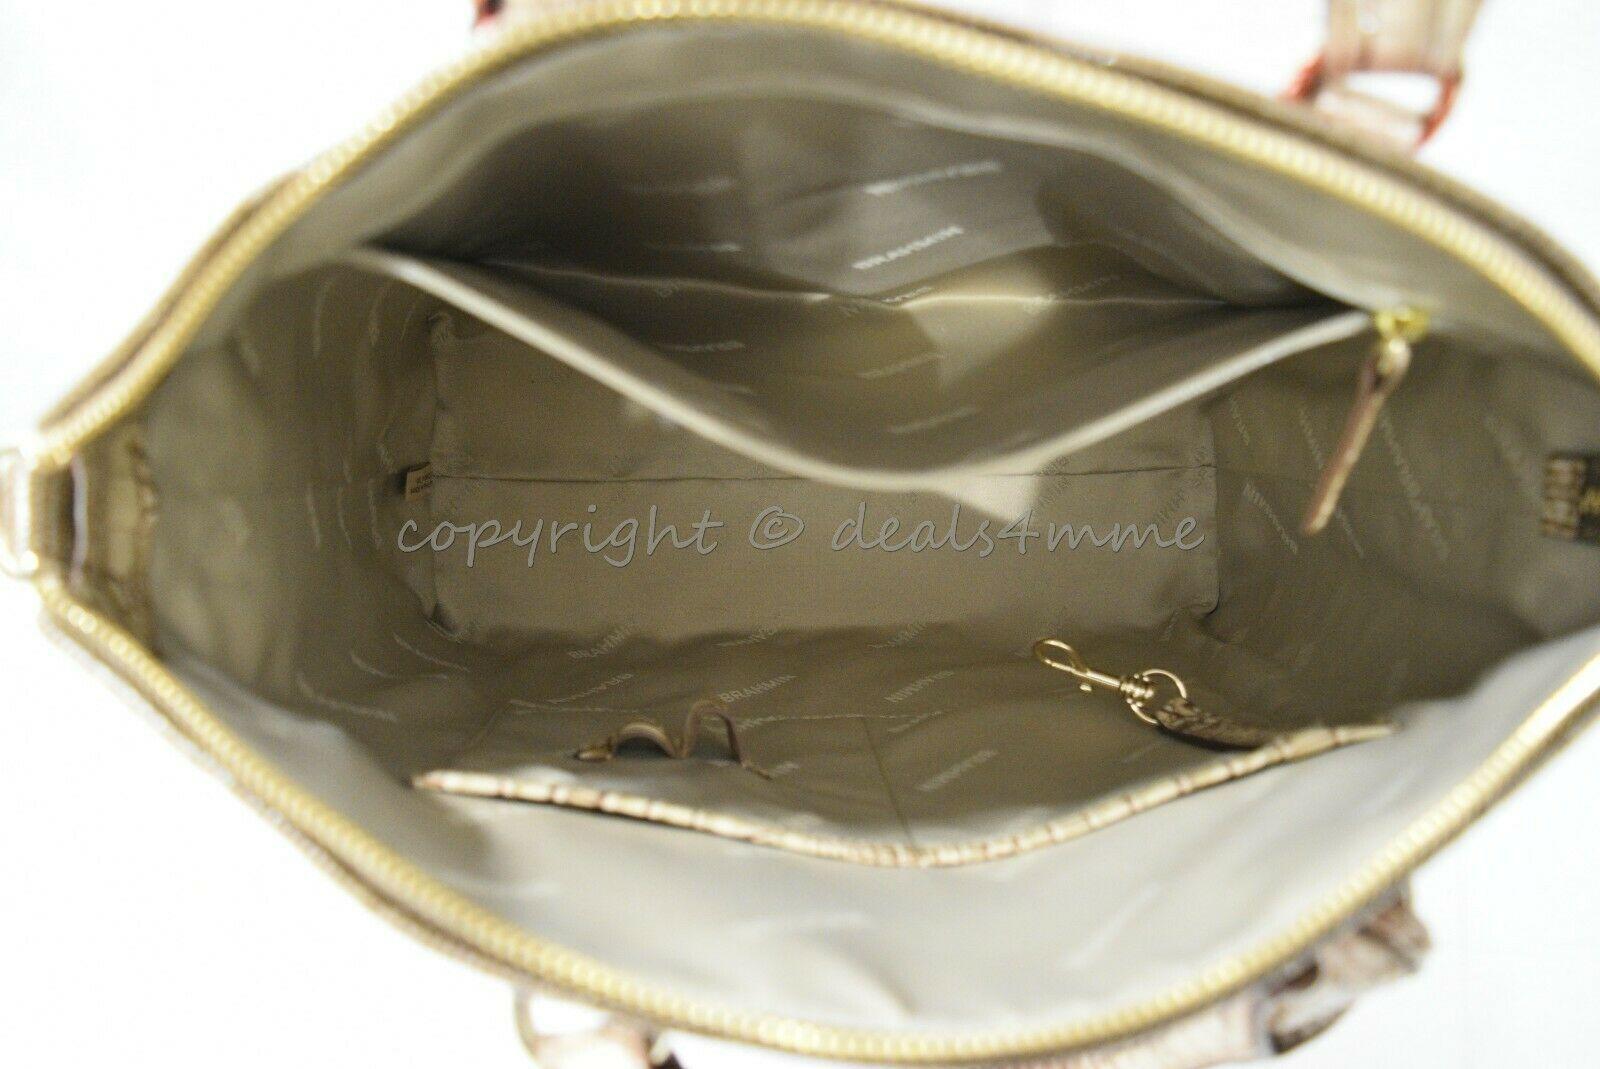 NWT Brahmin Large Duxbury Satchel/Shoulder Bag in Candy Apple Carlisle image 11